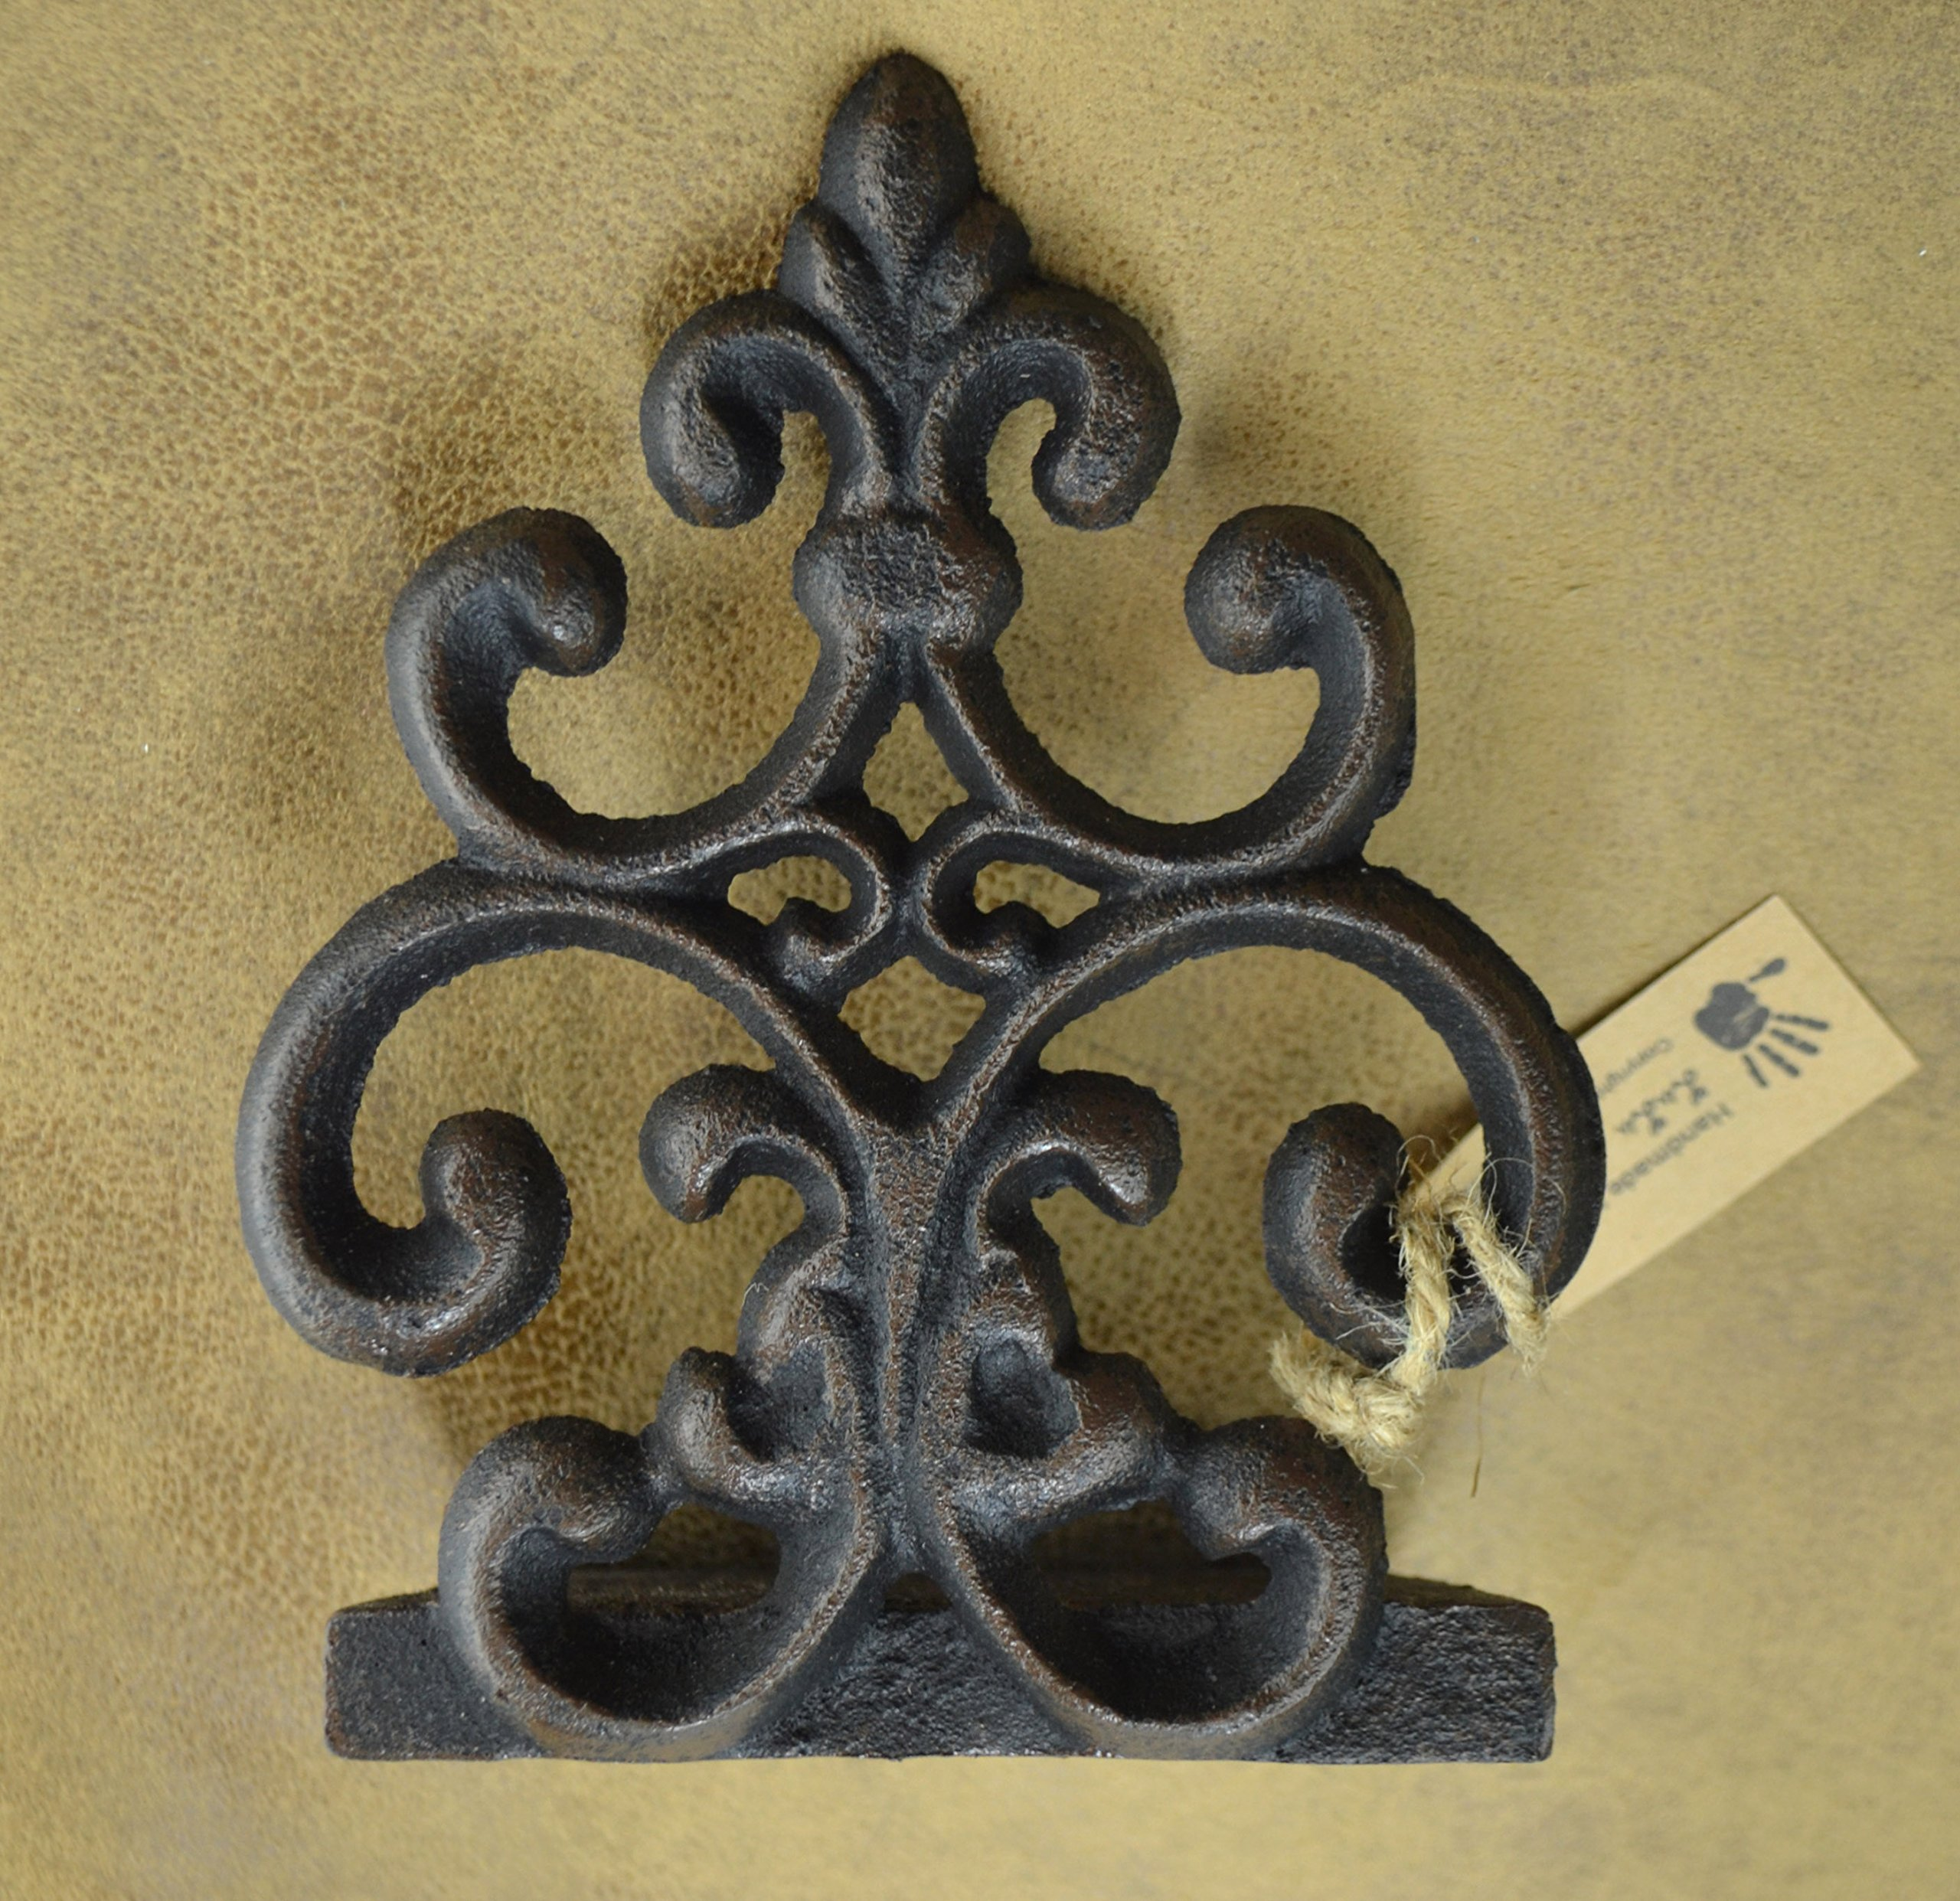 Lulu Decor, Cast Iron Fleur De Lis Door Stop, Door Stopper in Antique Black Finish, Beautiful and Useful Product (1) by Lulu Decor (Image #3)